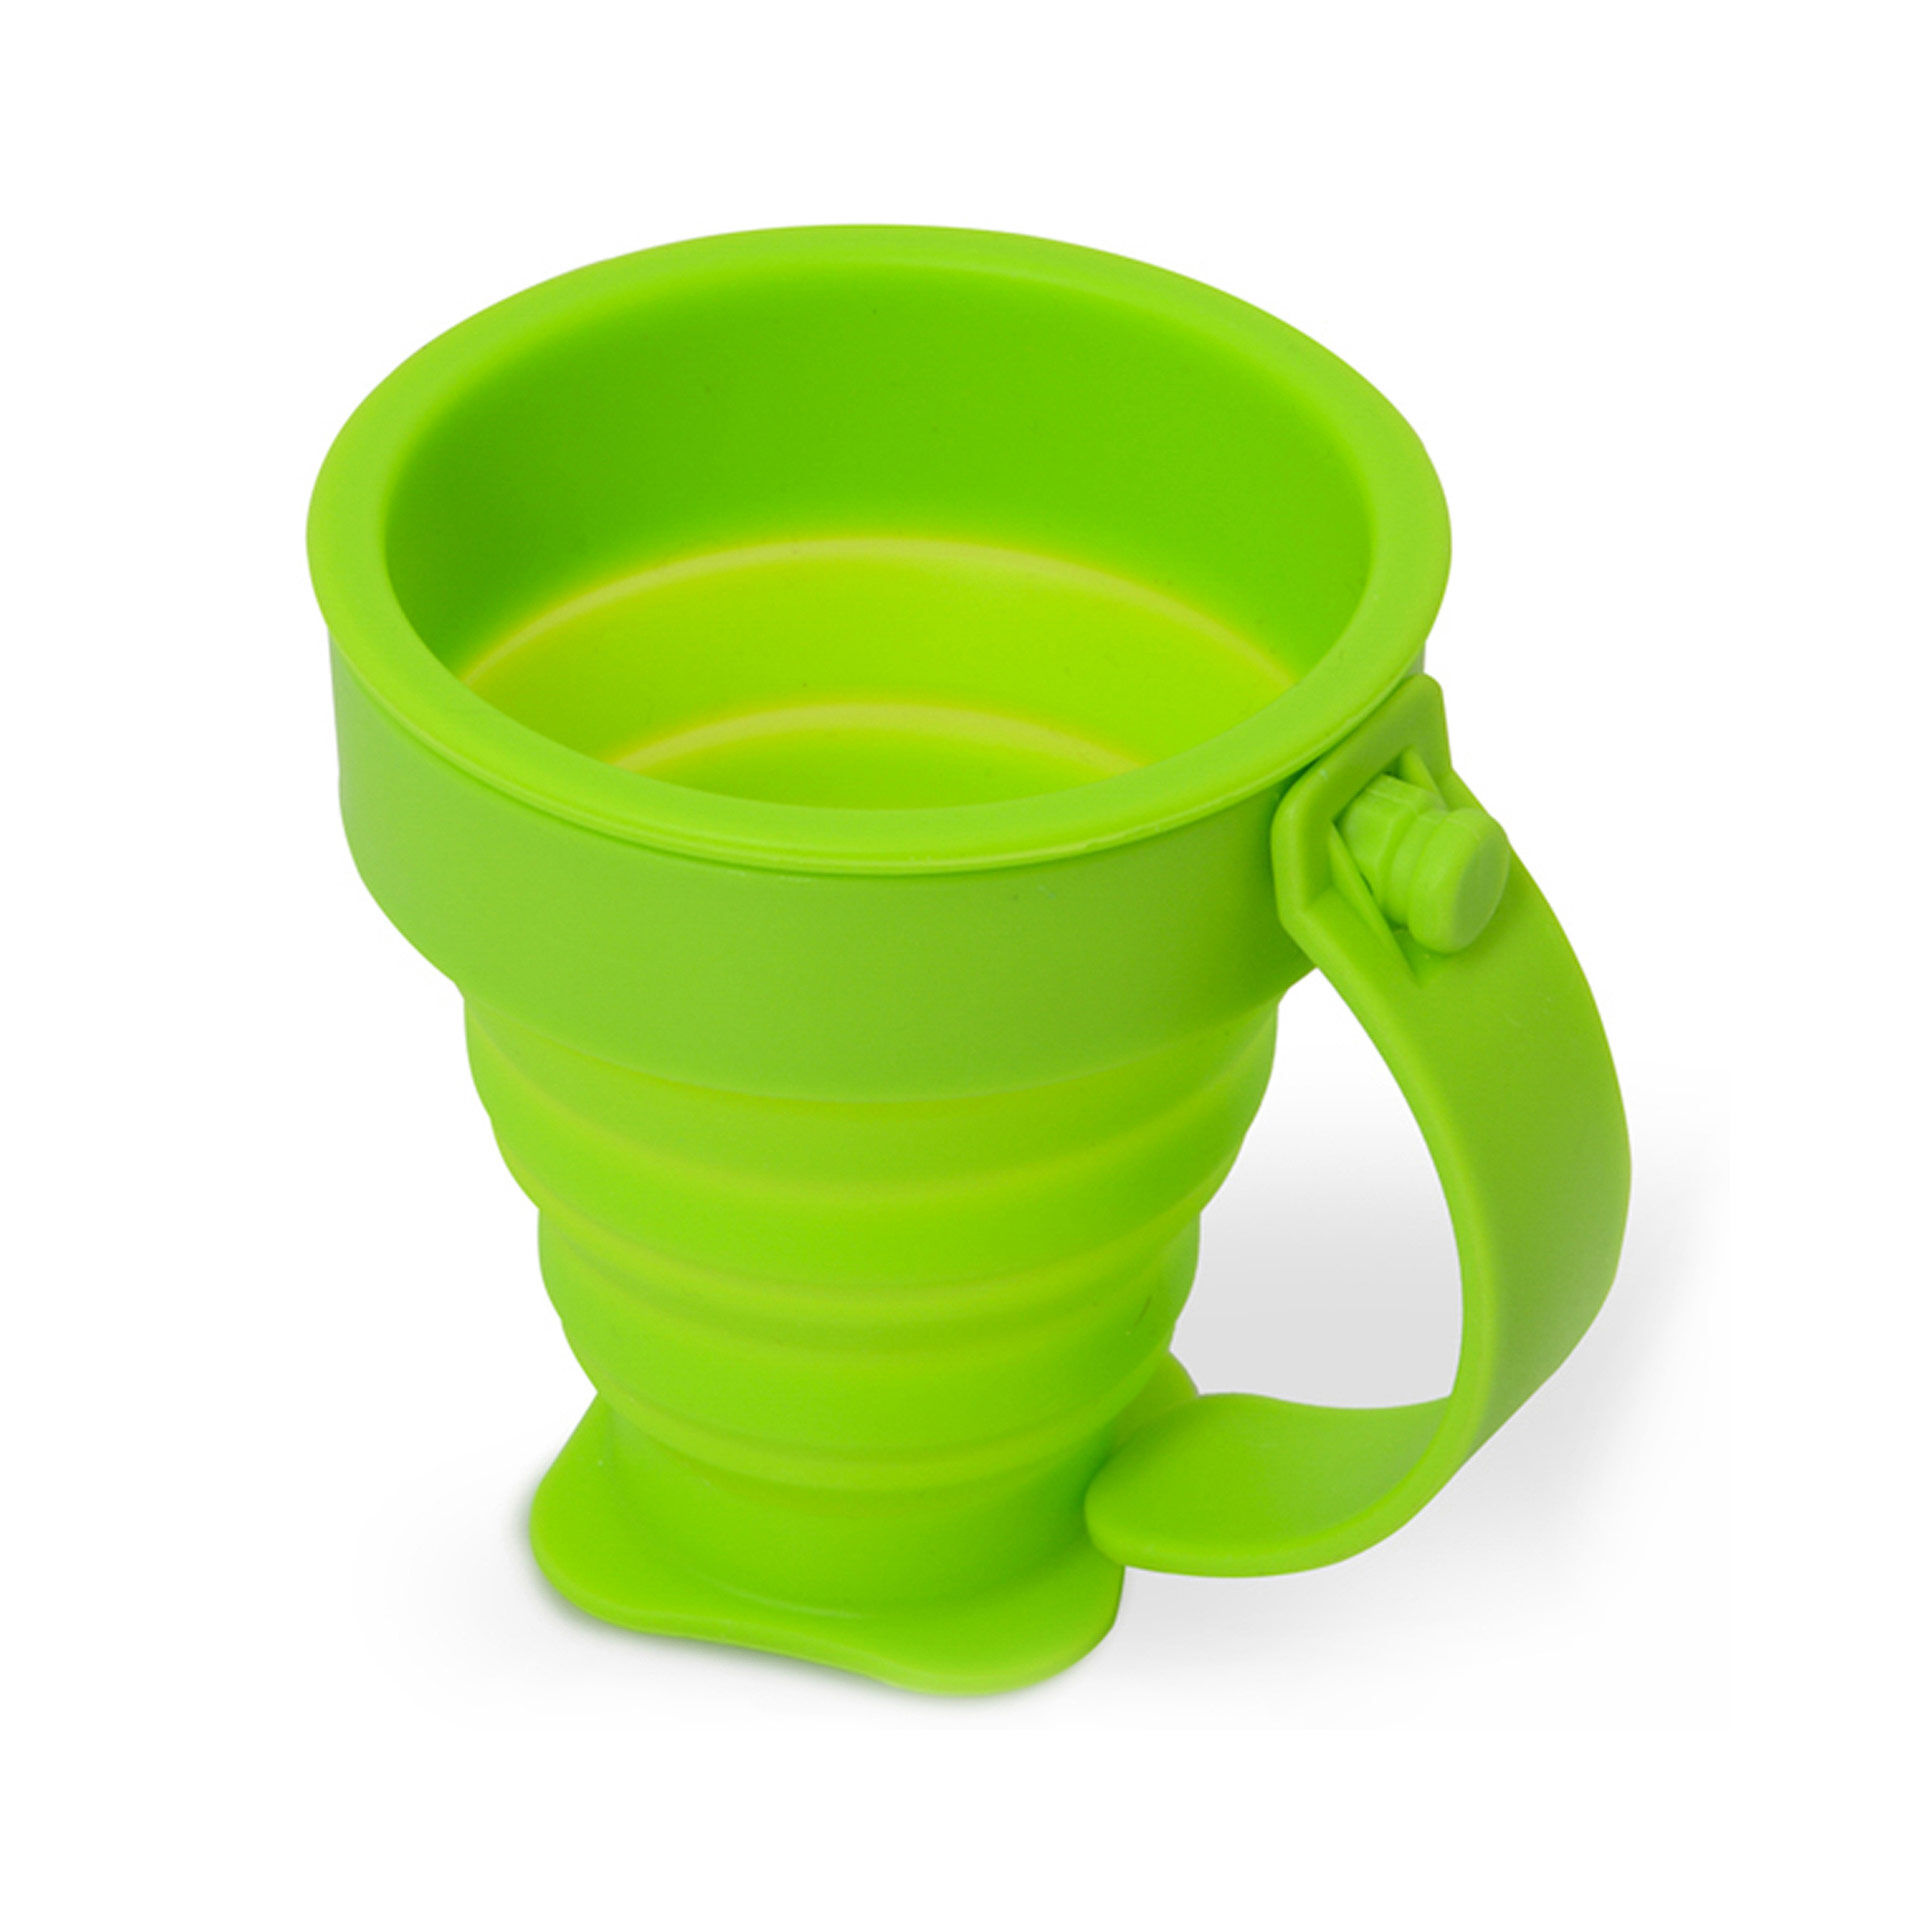 Tasse pliante en silicone, , large